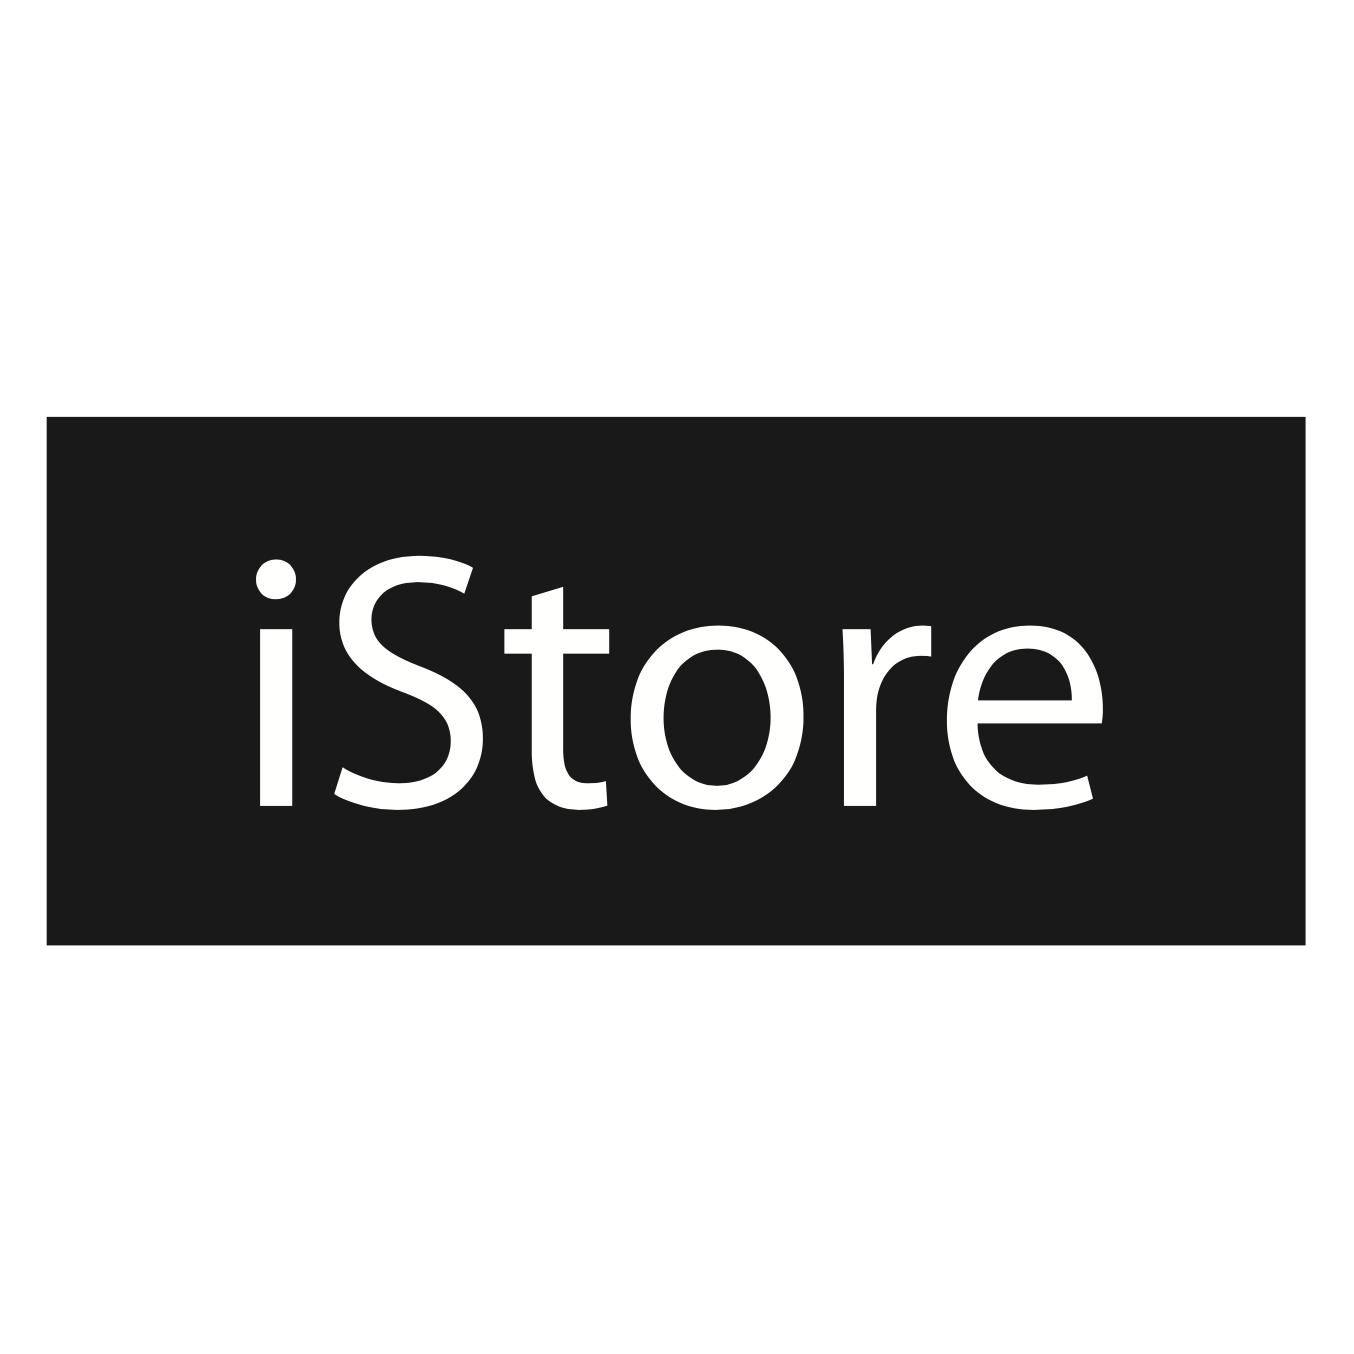 MacBook Pro / Air 13-inch Neoprene Classic Sleeve - Black